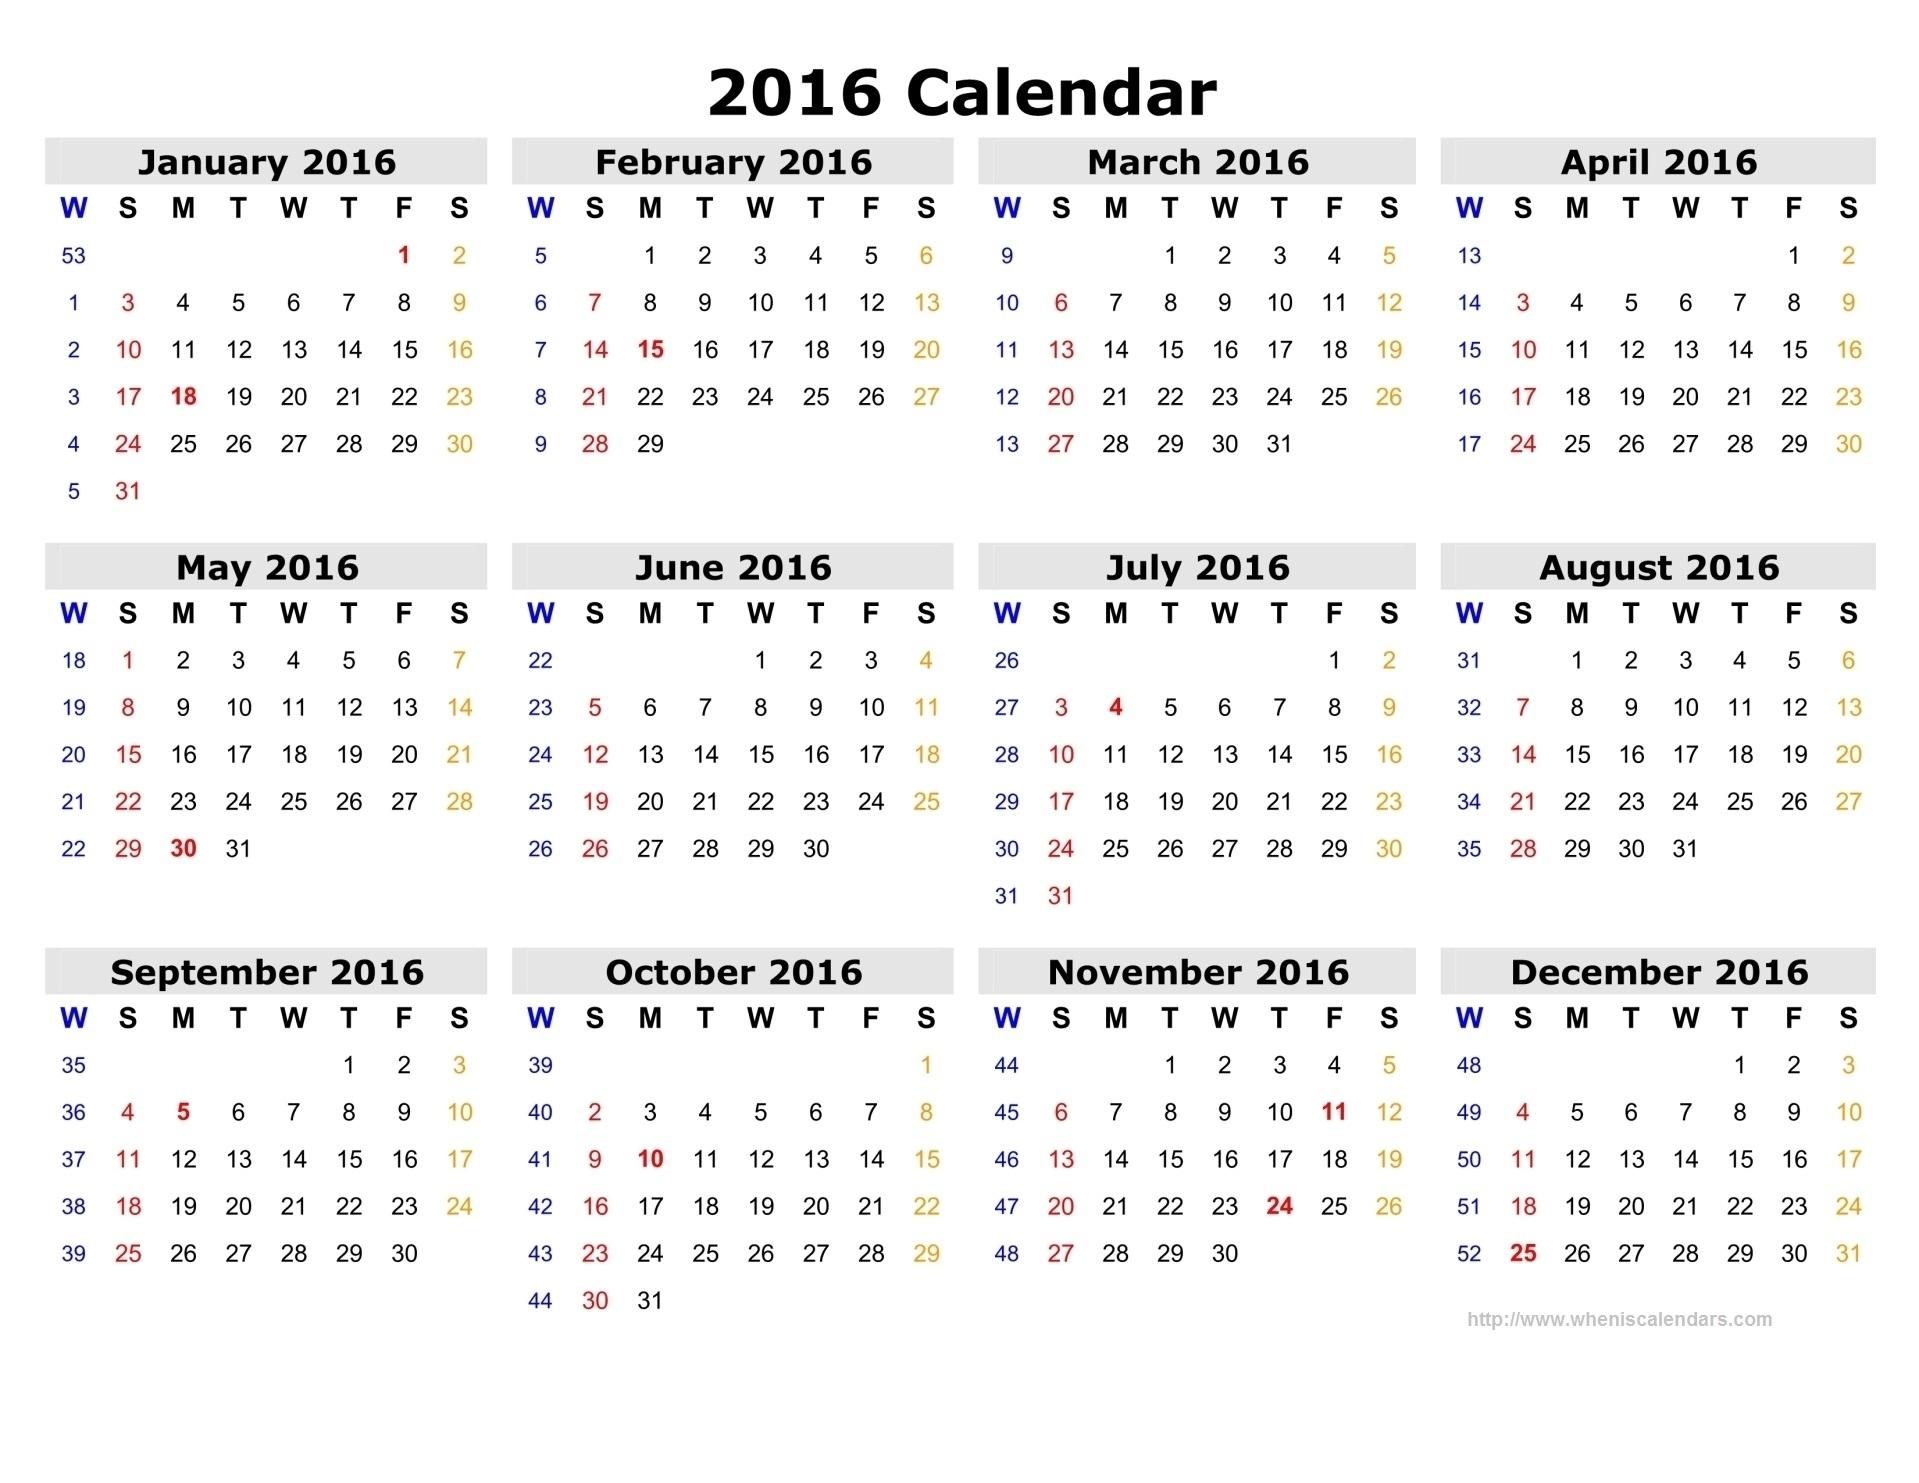 Calendar 2016 12 Months, Indicating Number Weeks 2016